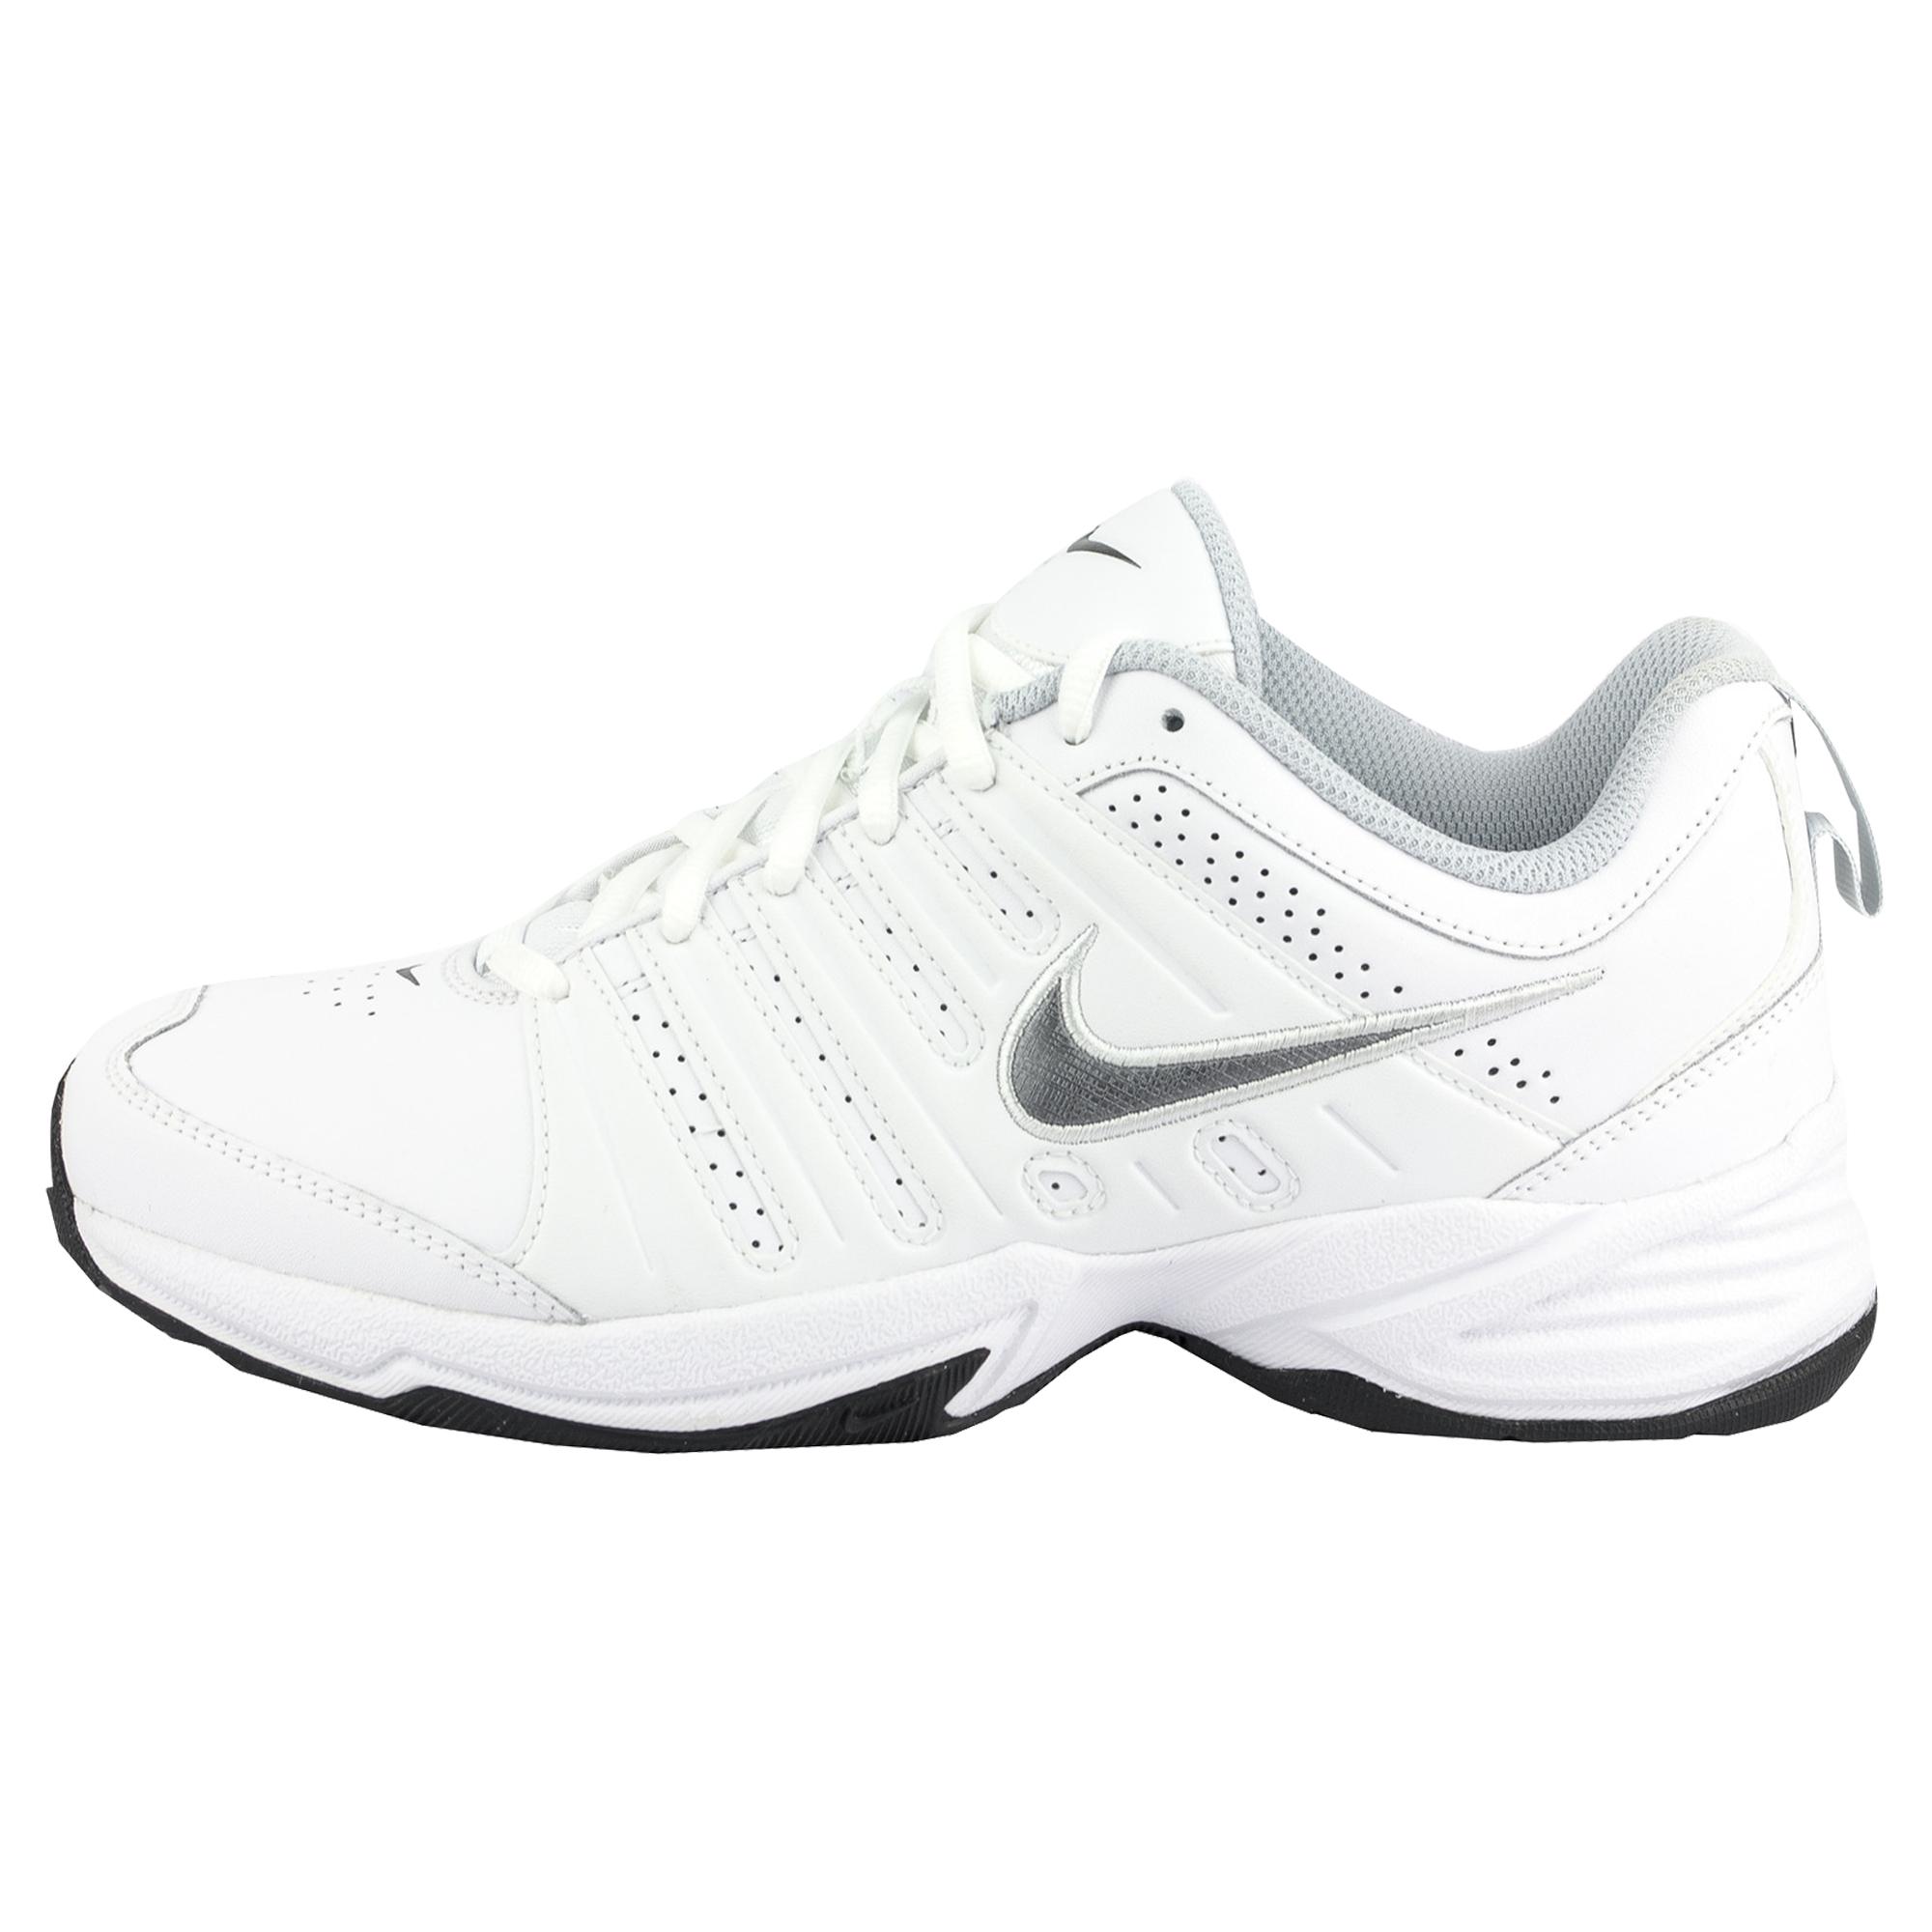 Nike T Lite X Erkek Spor Ayakkabı 477692 107 Barcincom